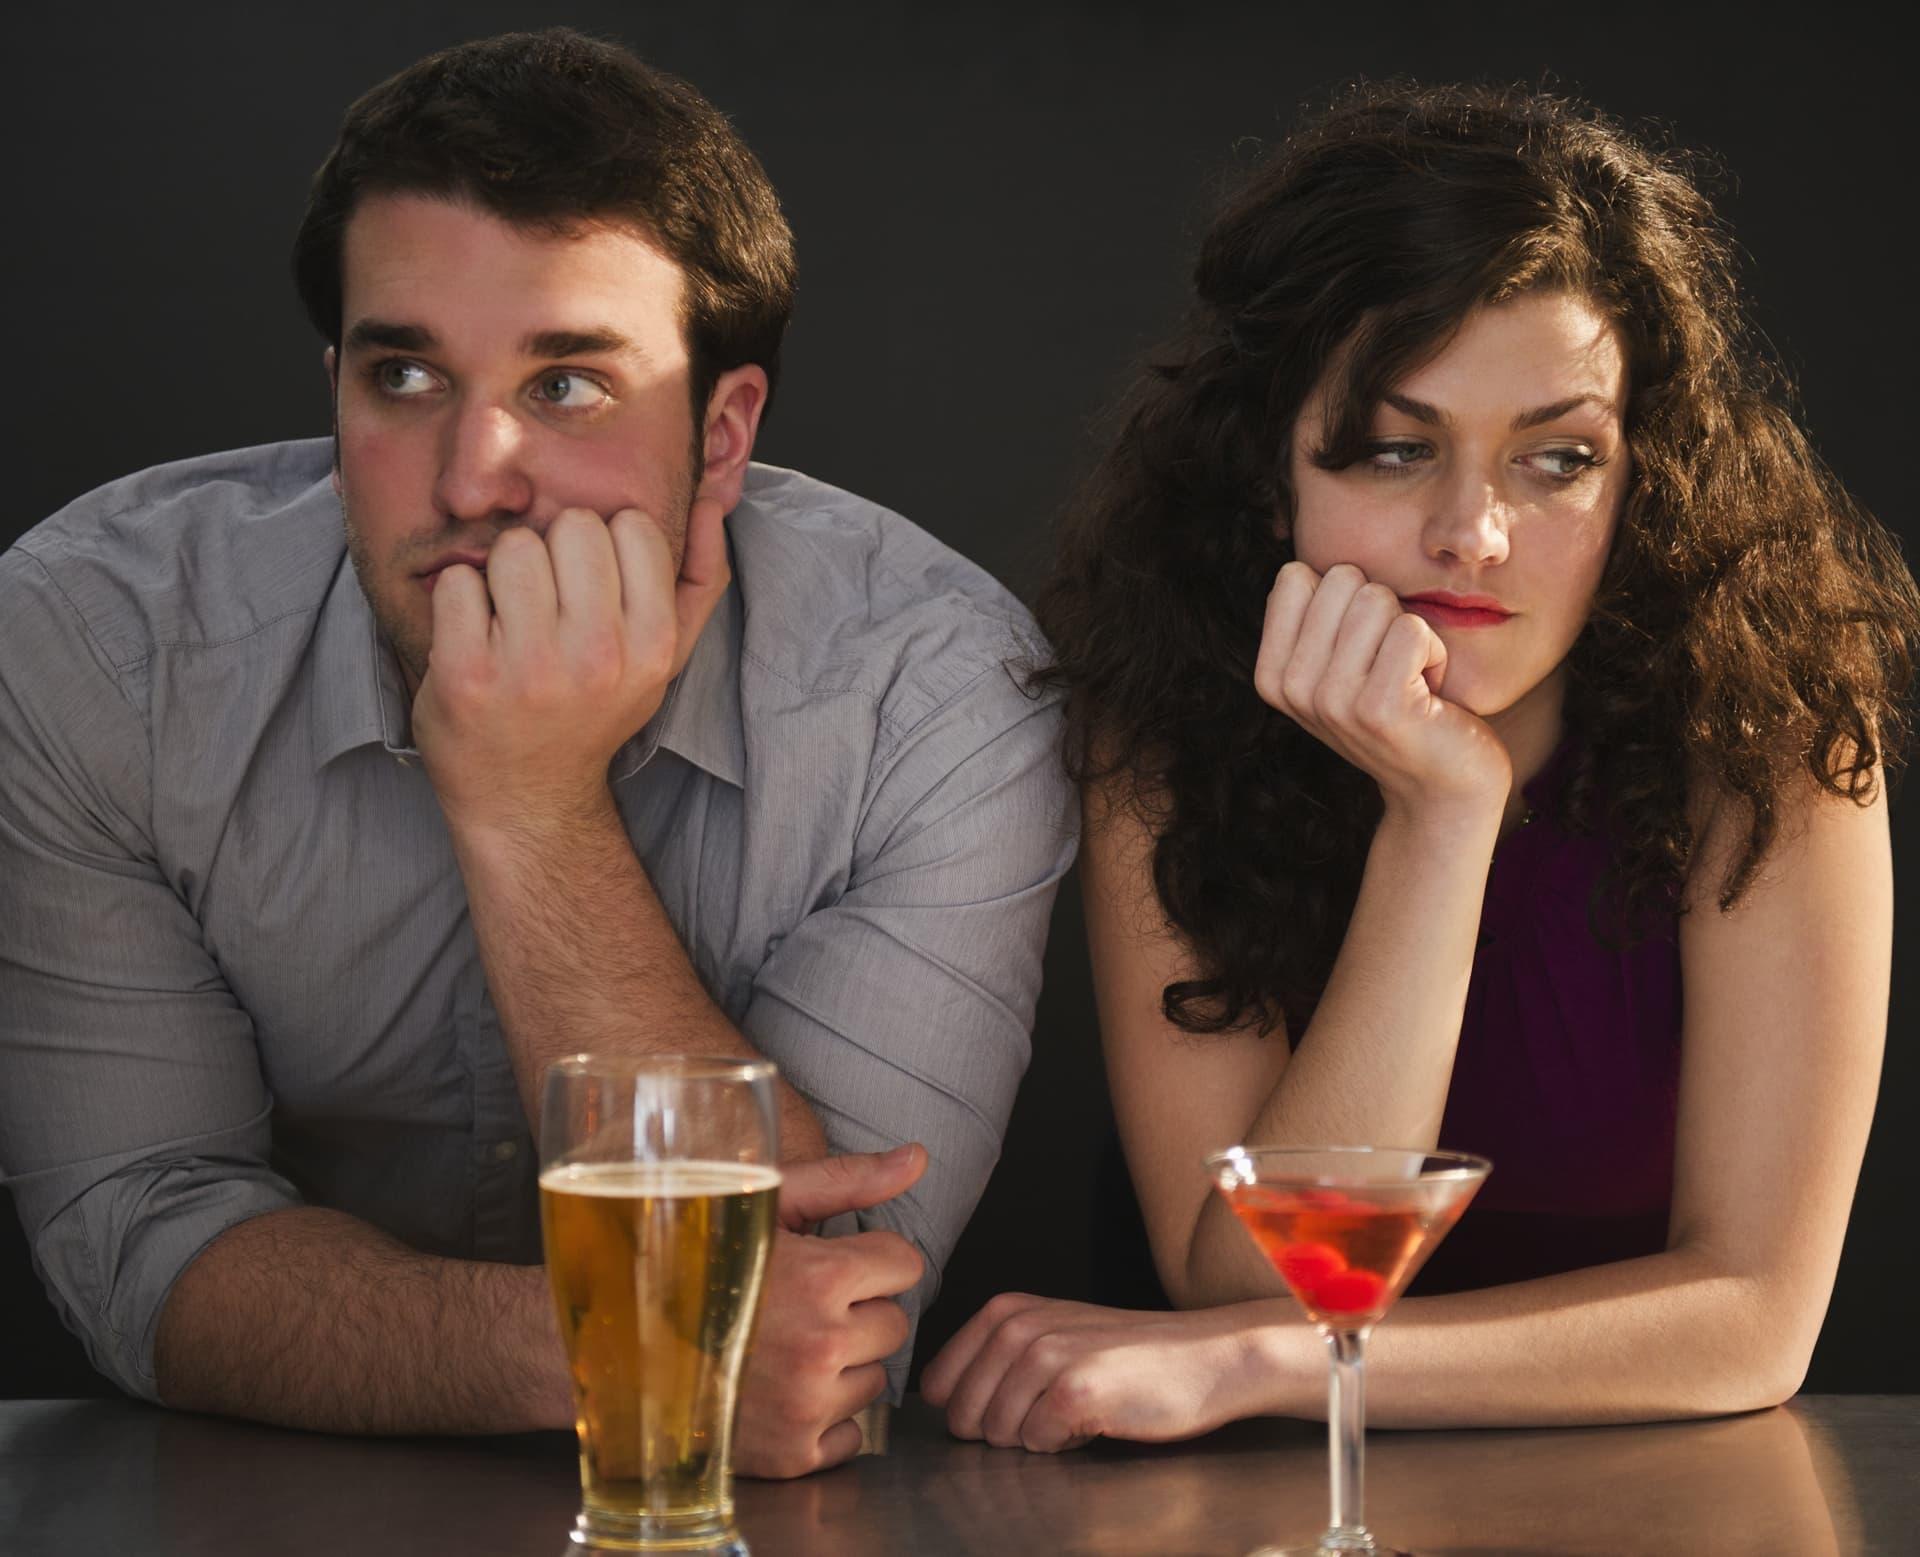 Мужчина и женщина на свидании